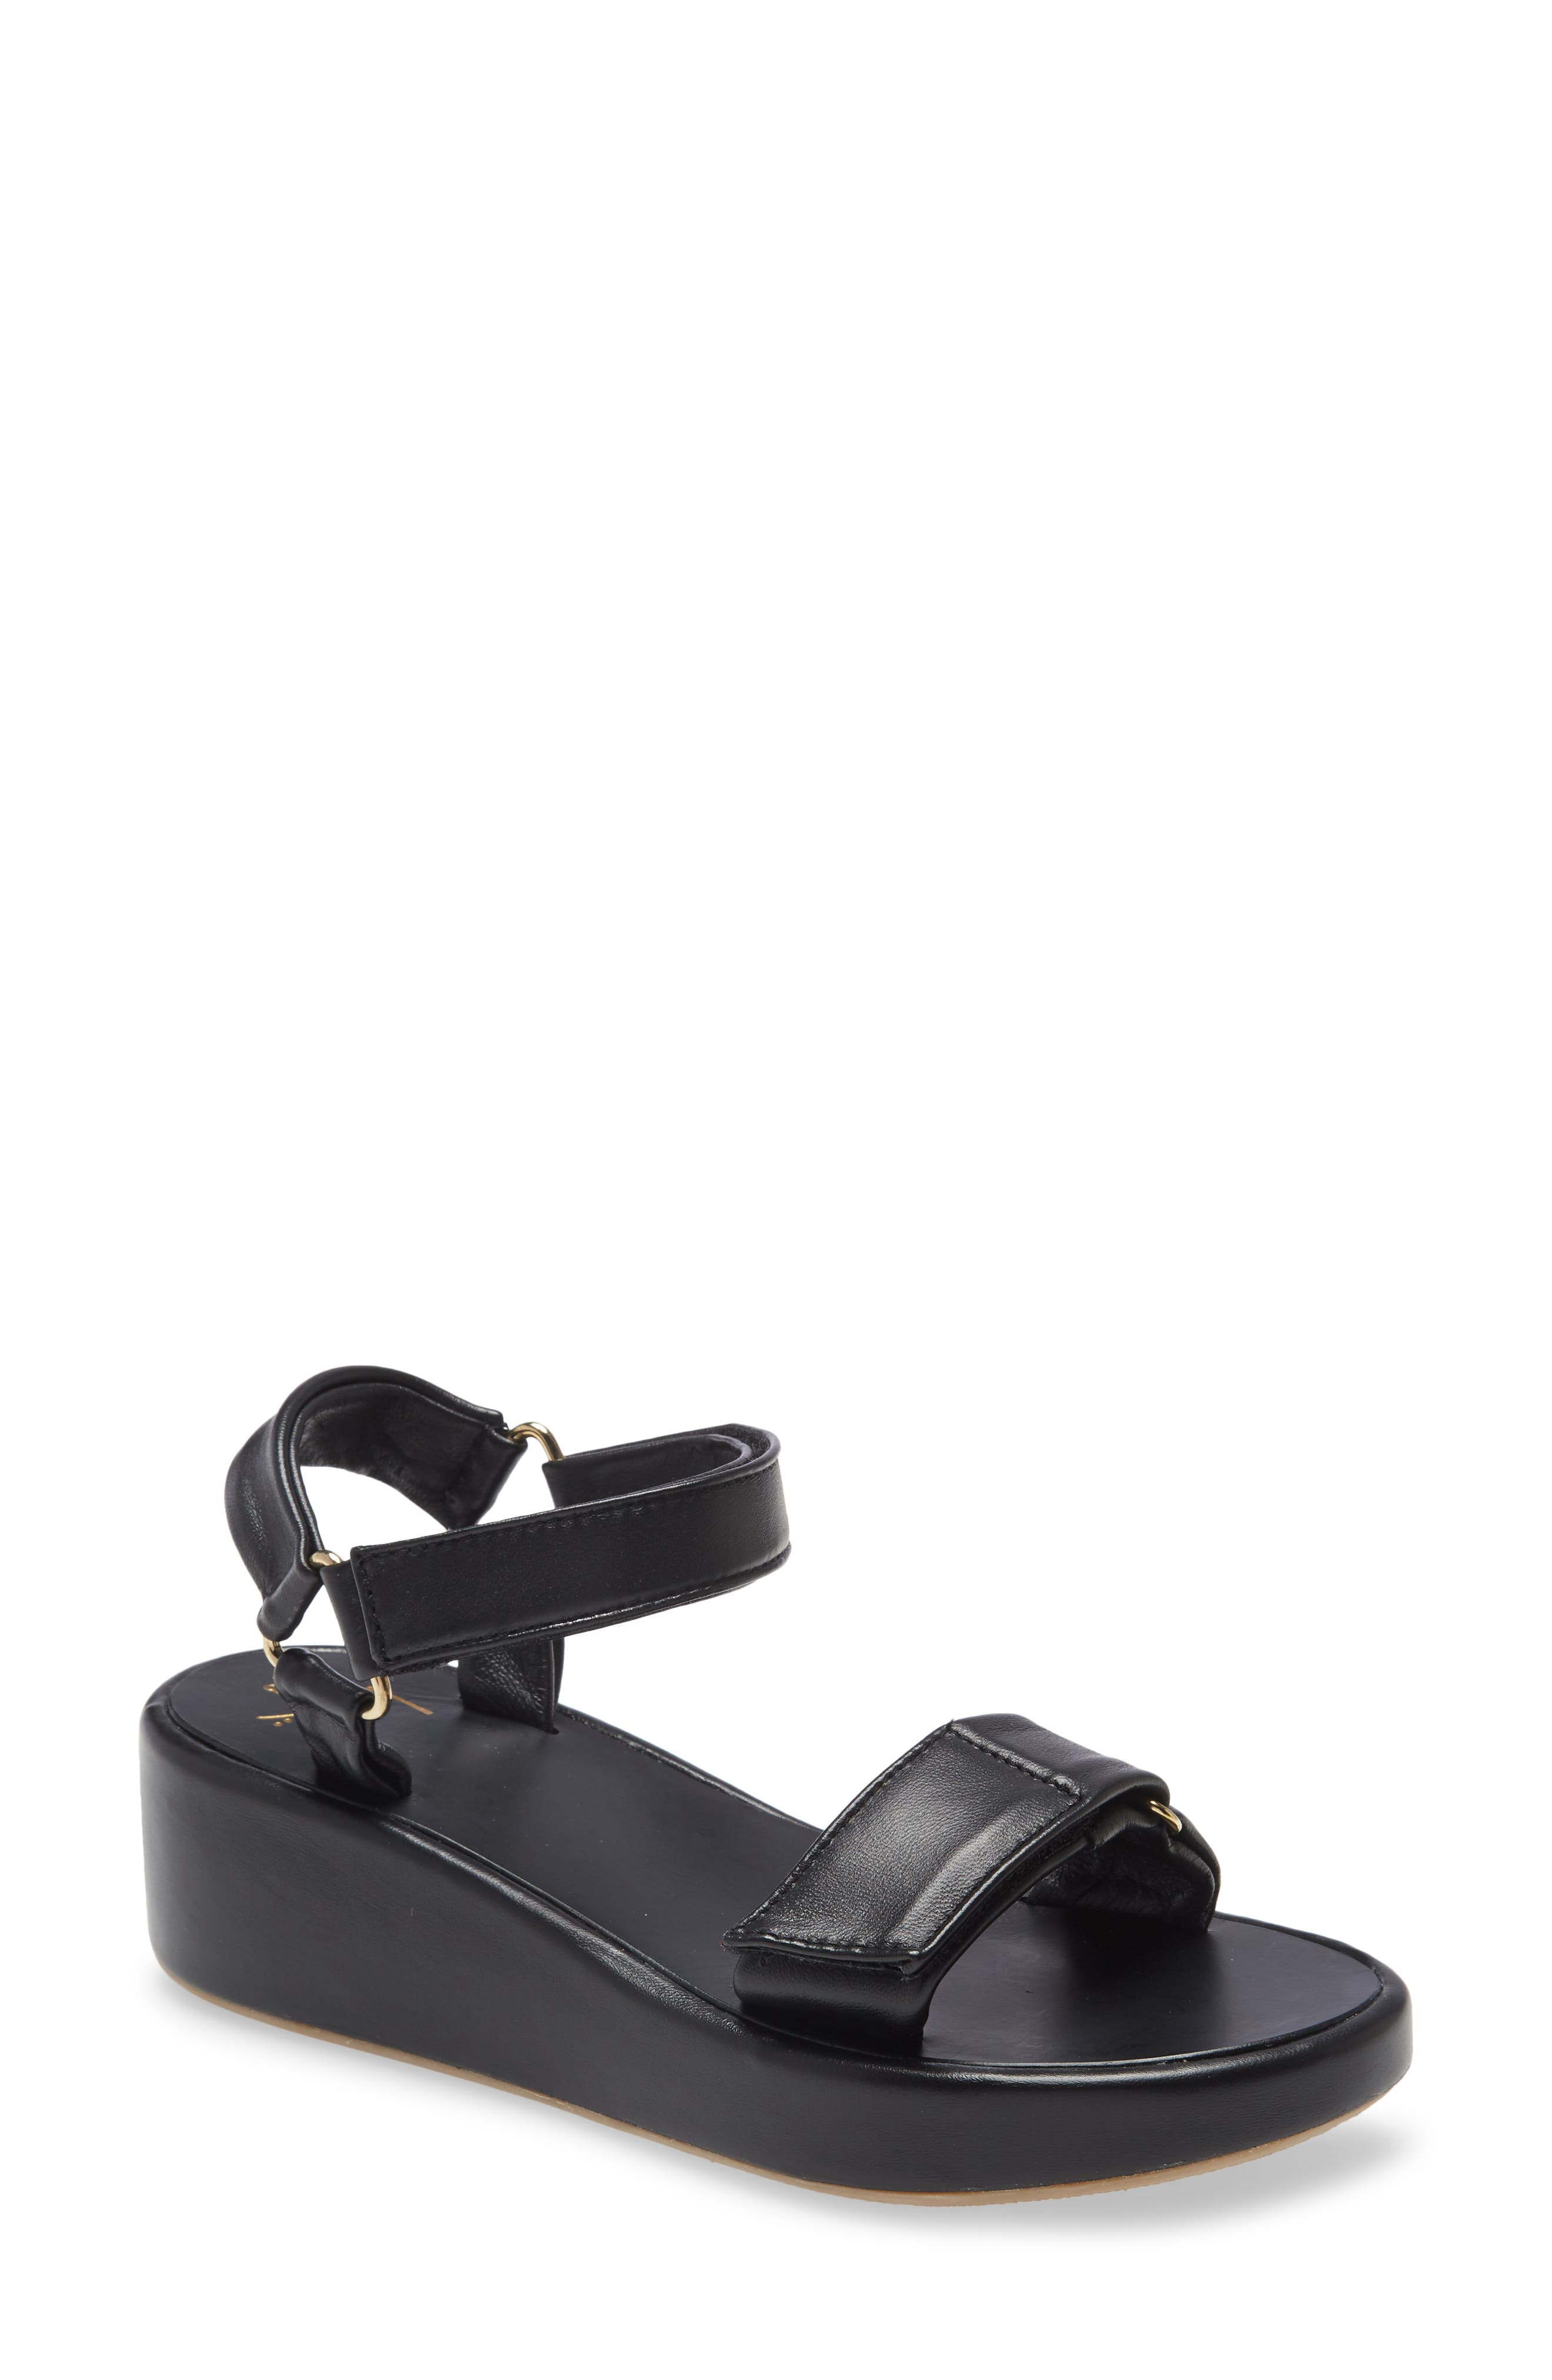 Roo Wedge Sandal